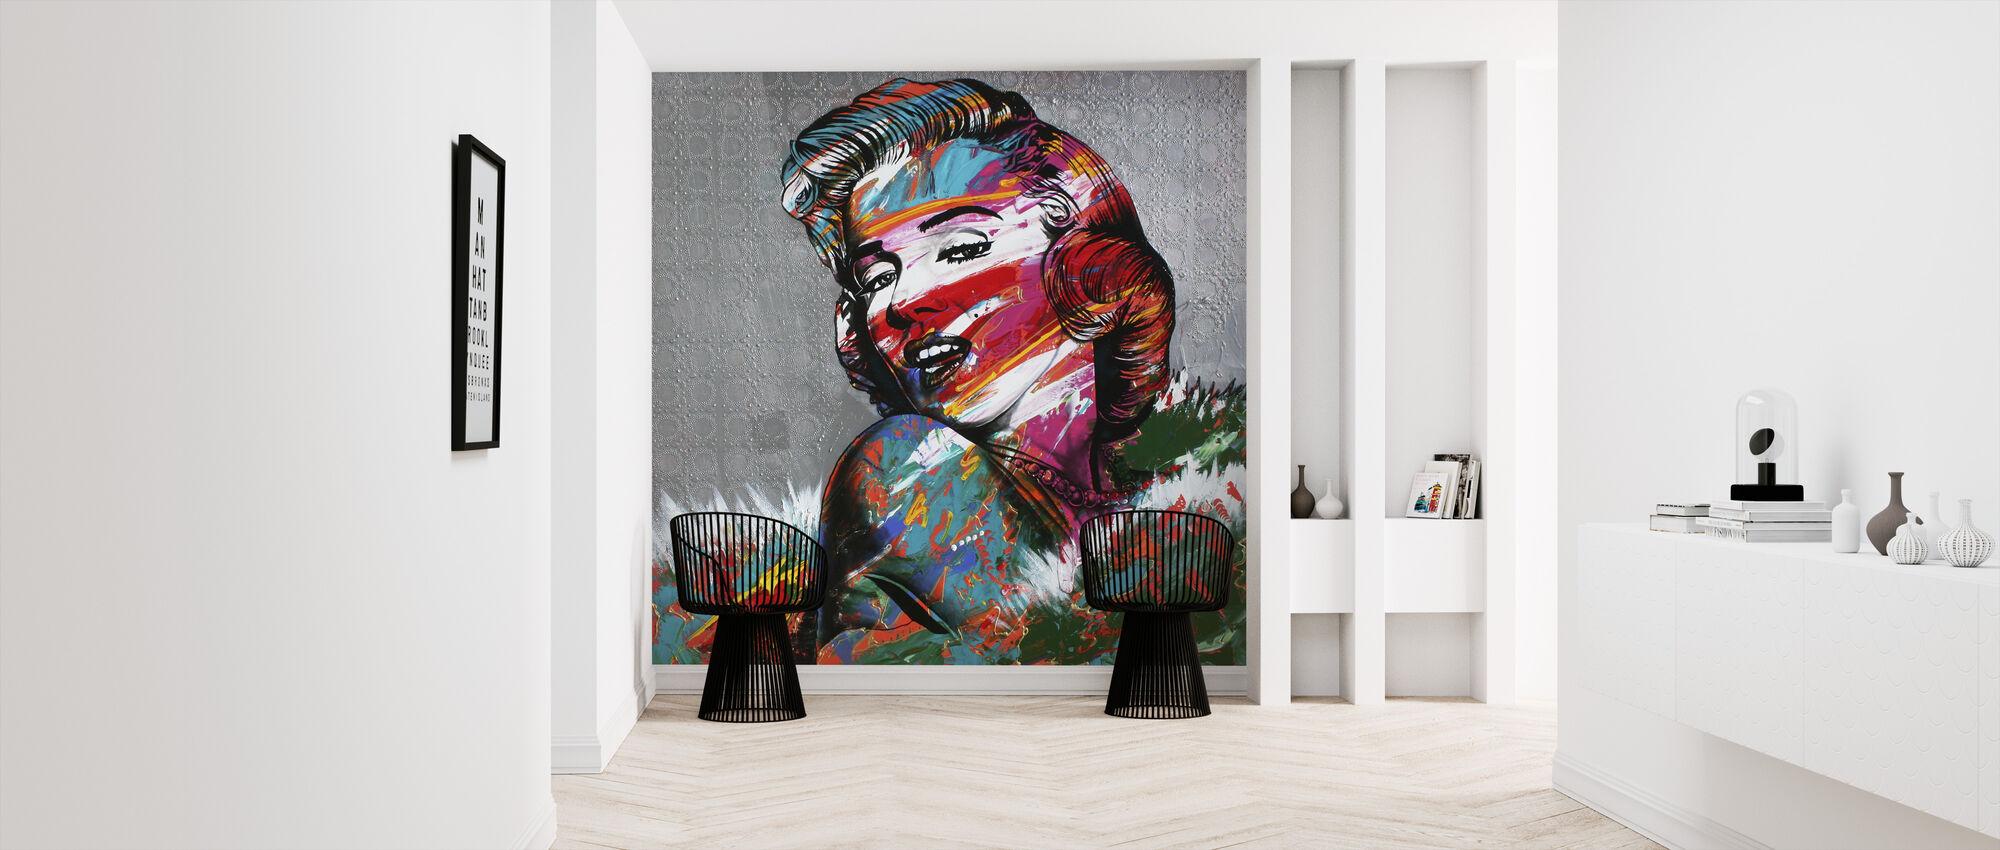 Electric Smile - Wallpaper - Hallway